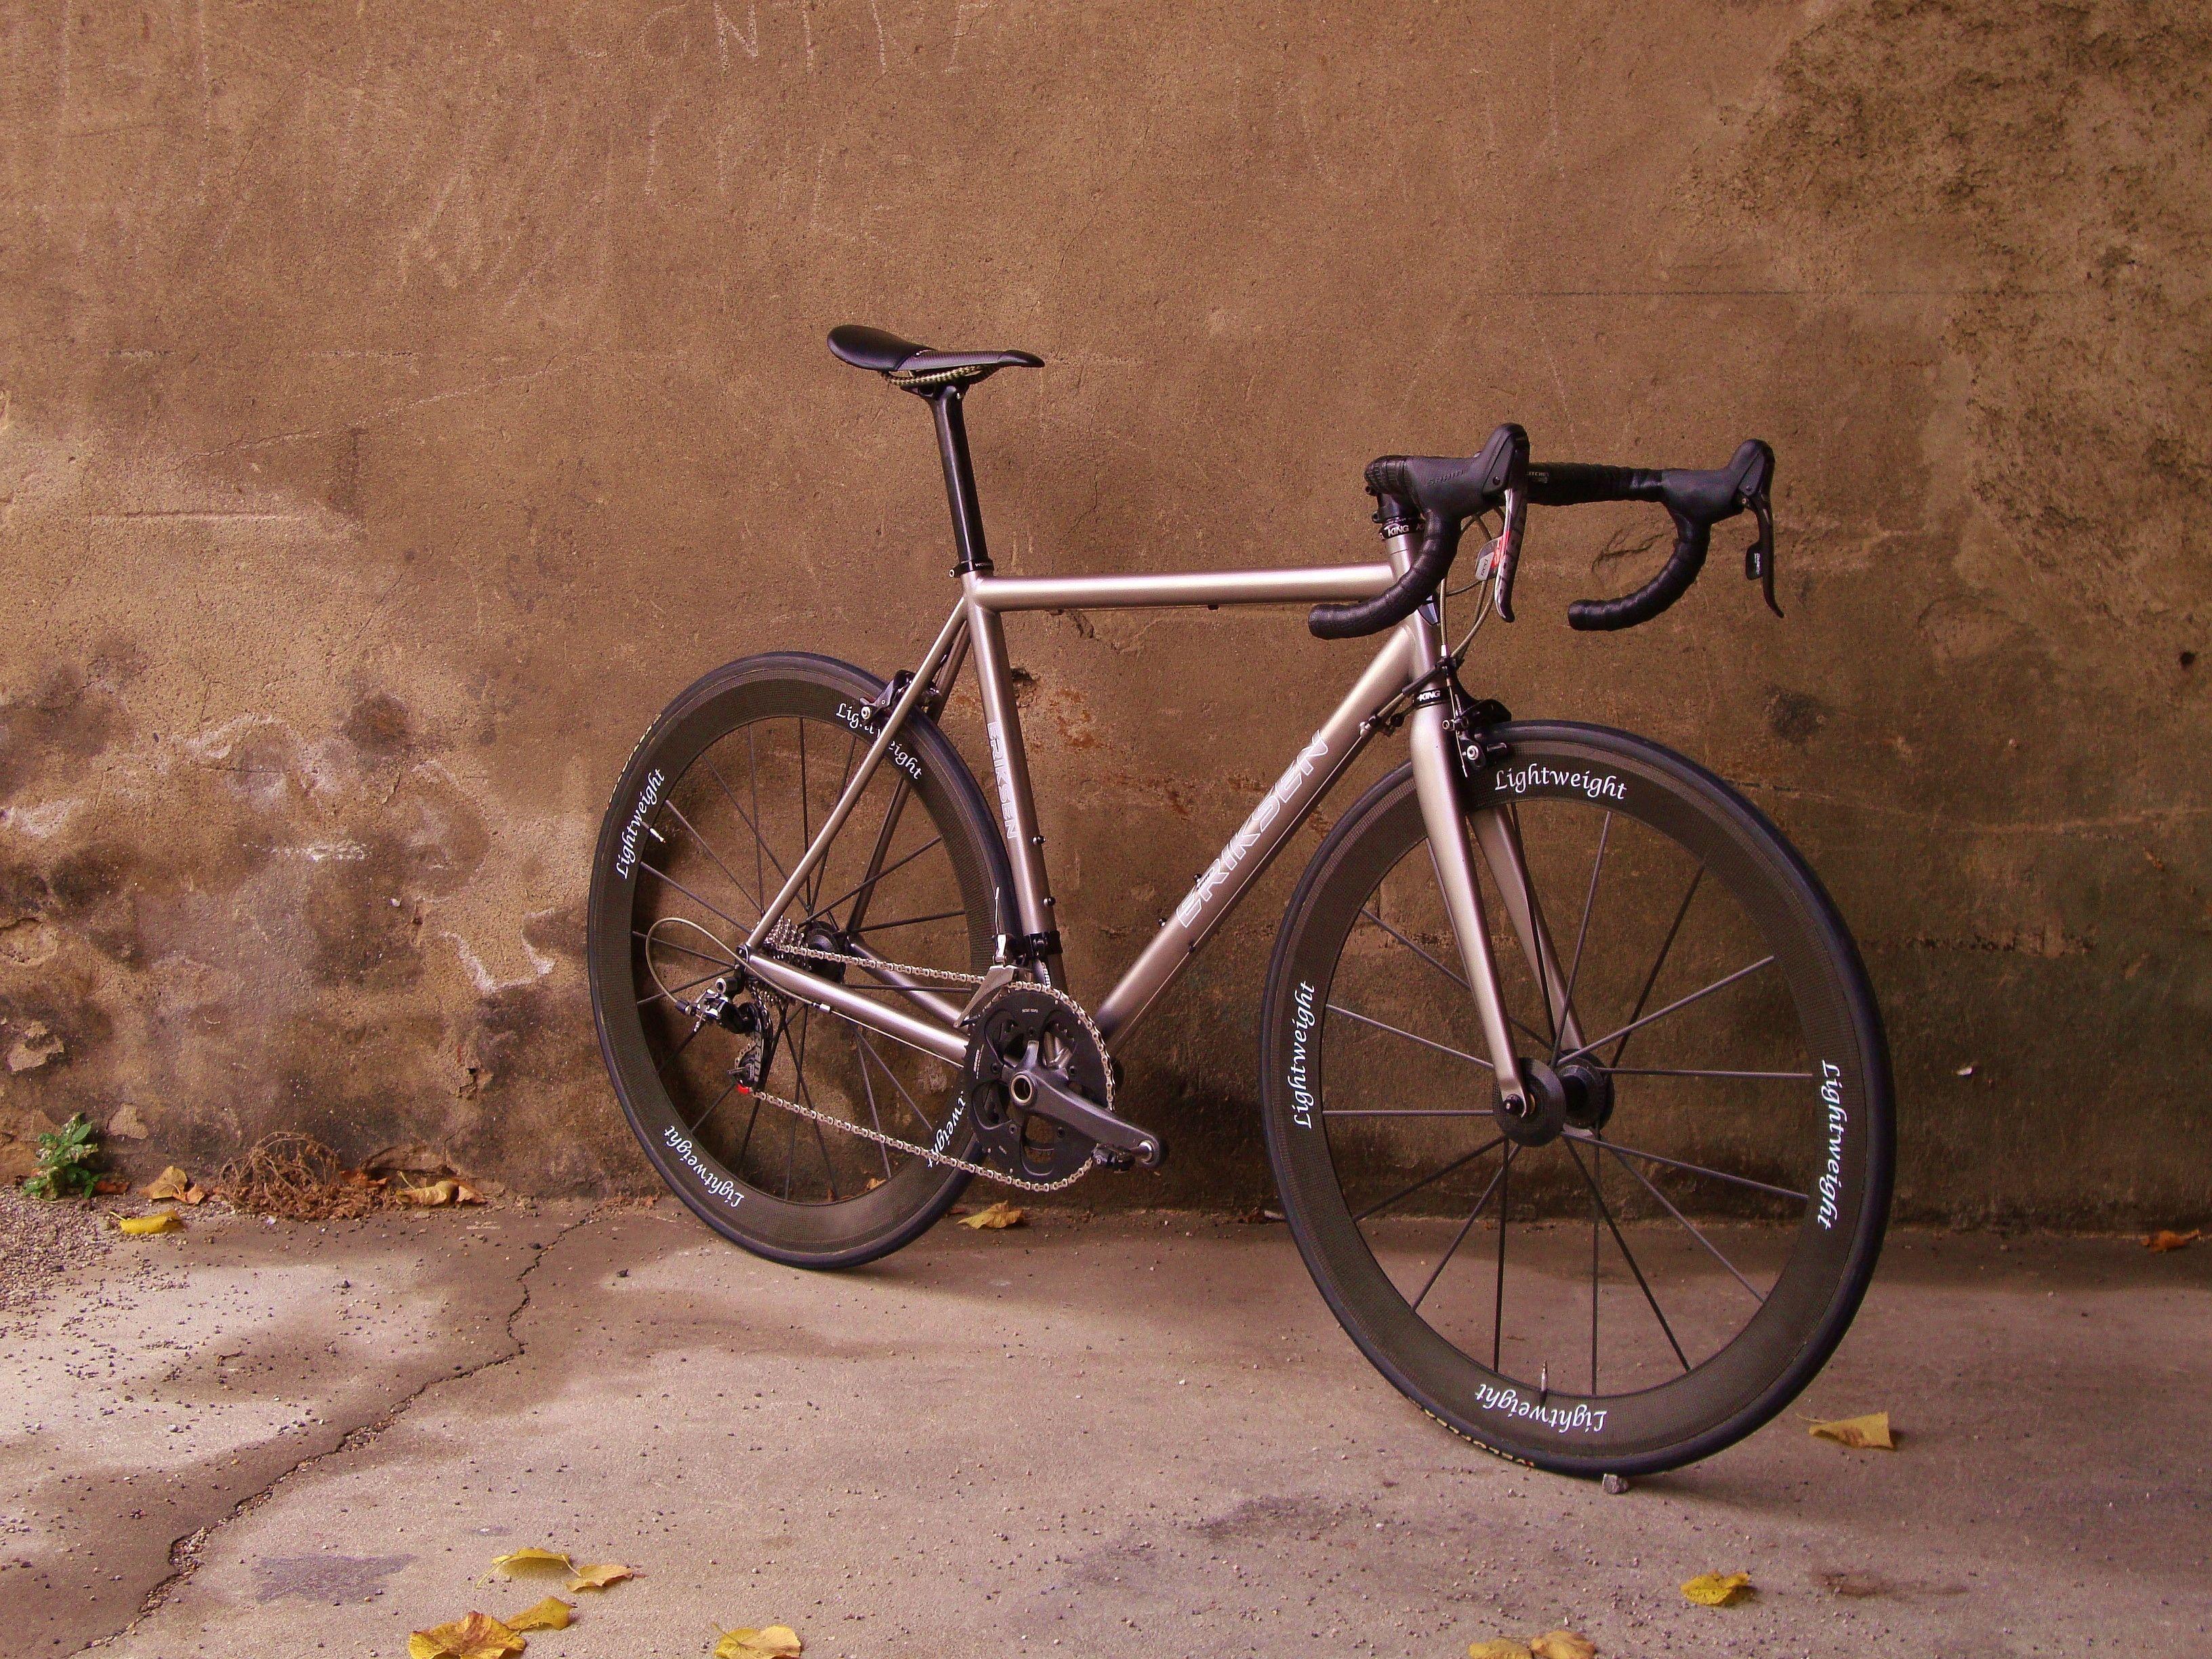 Pin By Luis Firmo On Bike Touring In 2020 Titanium Bike